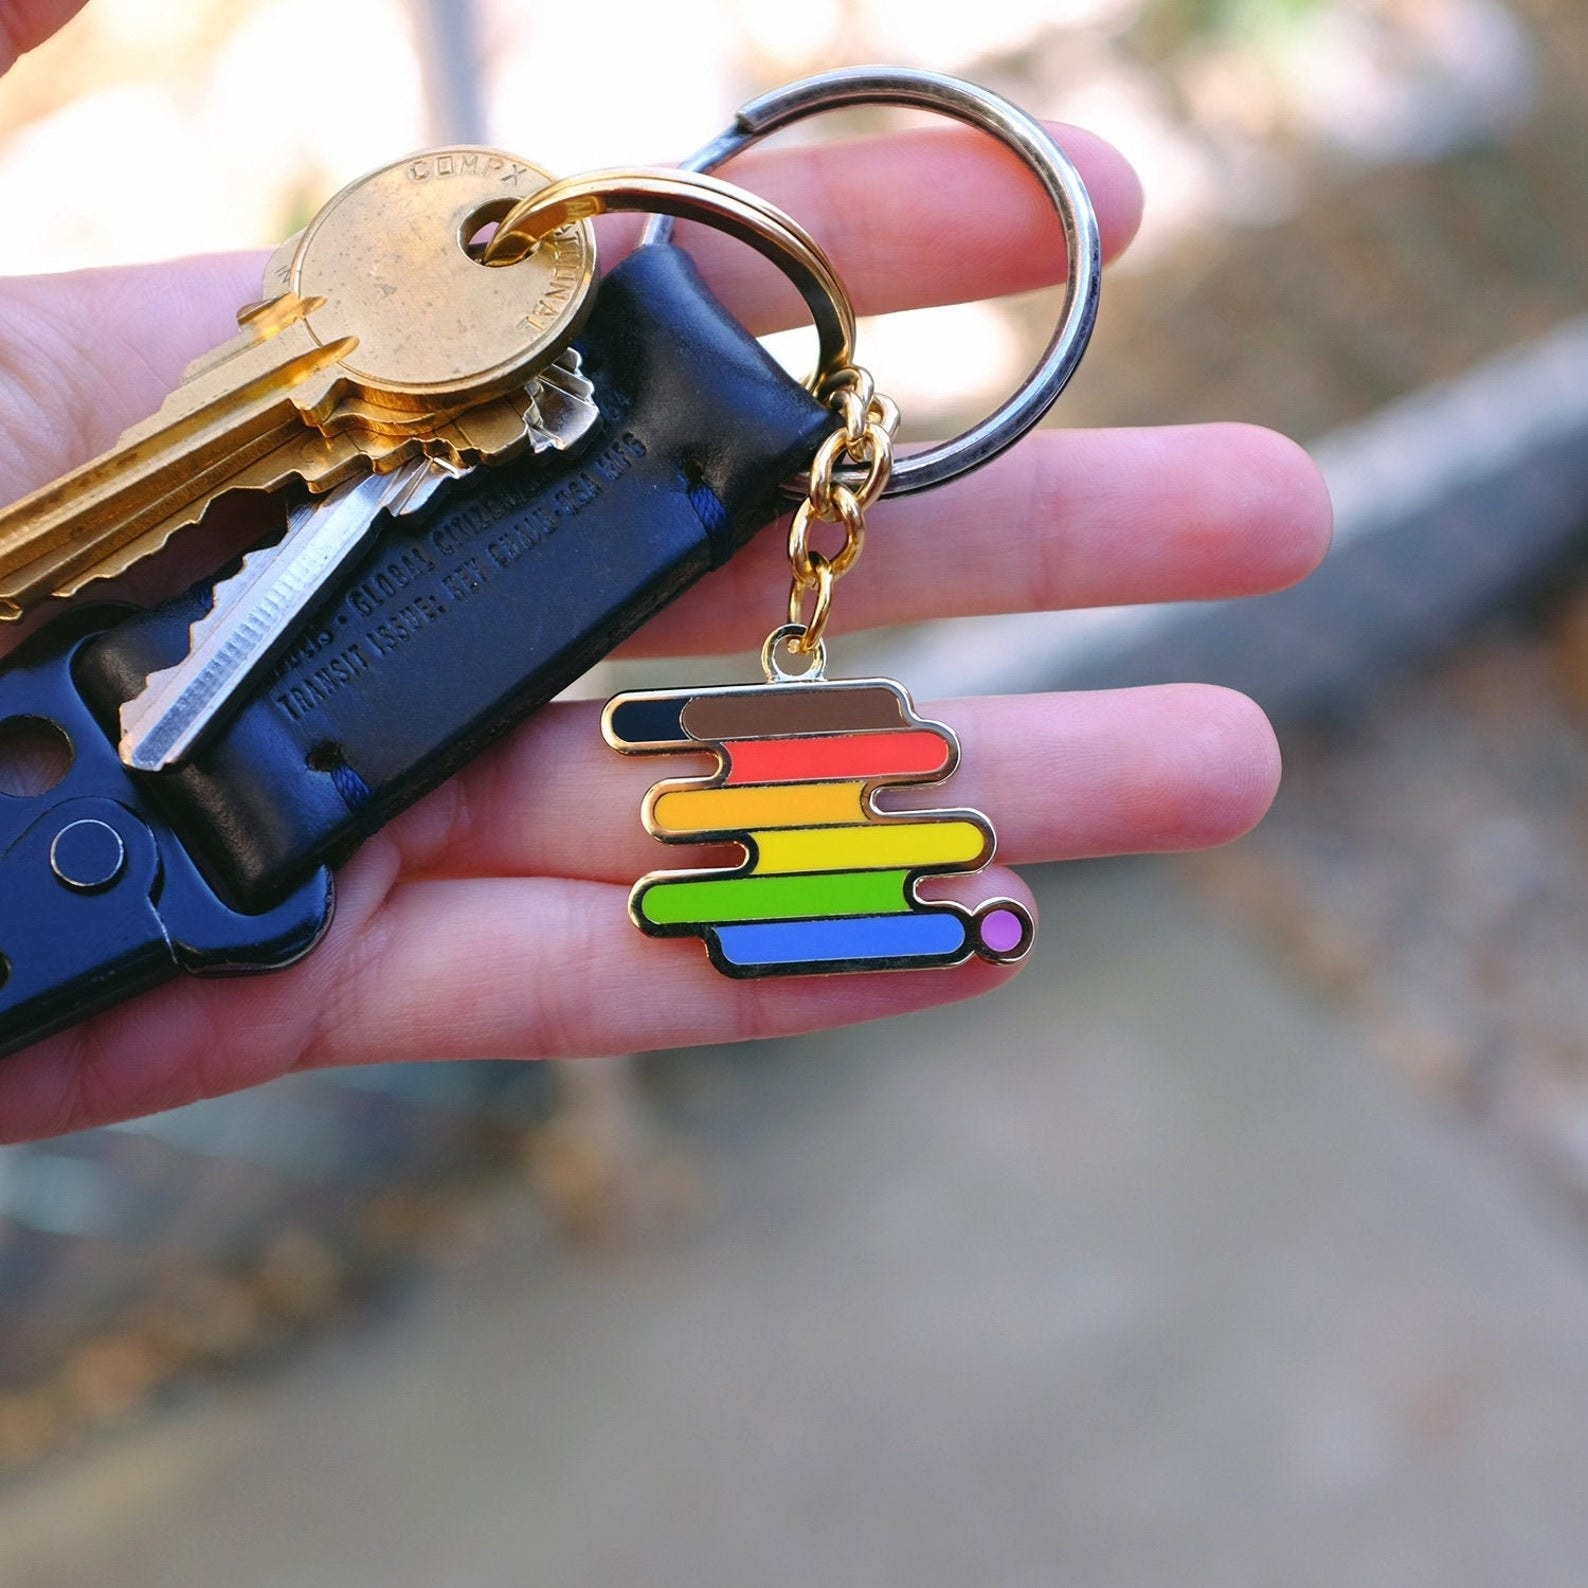 QPOC Pride keychain with rainbow design on a set of keys